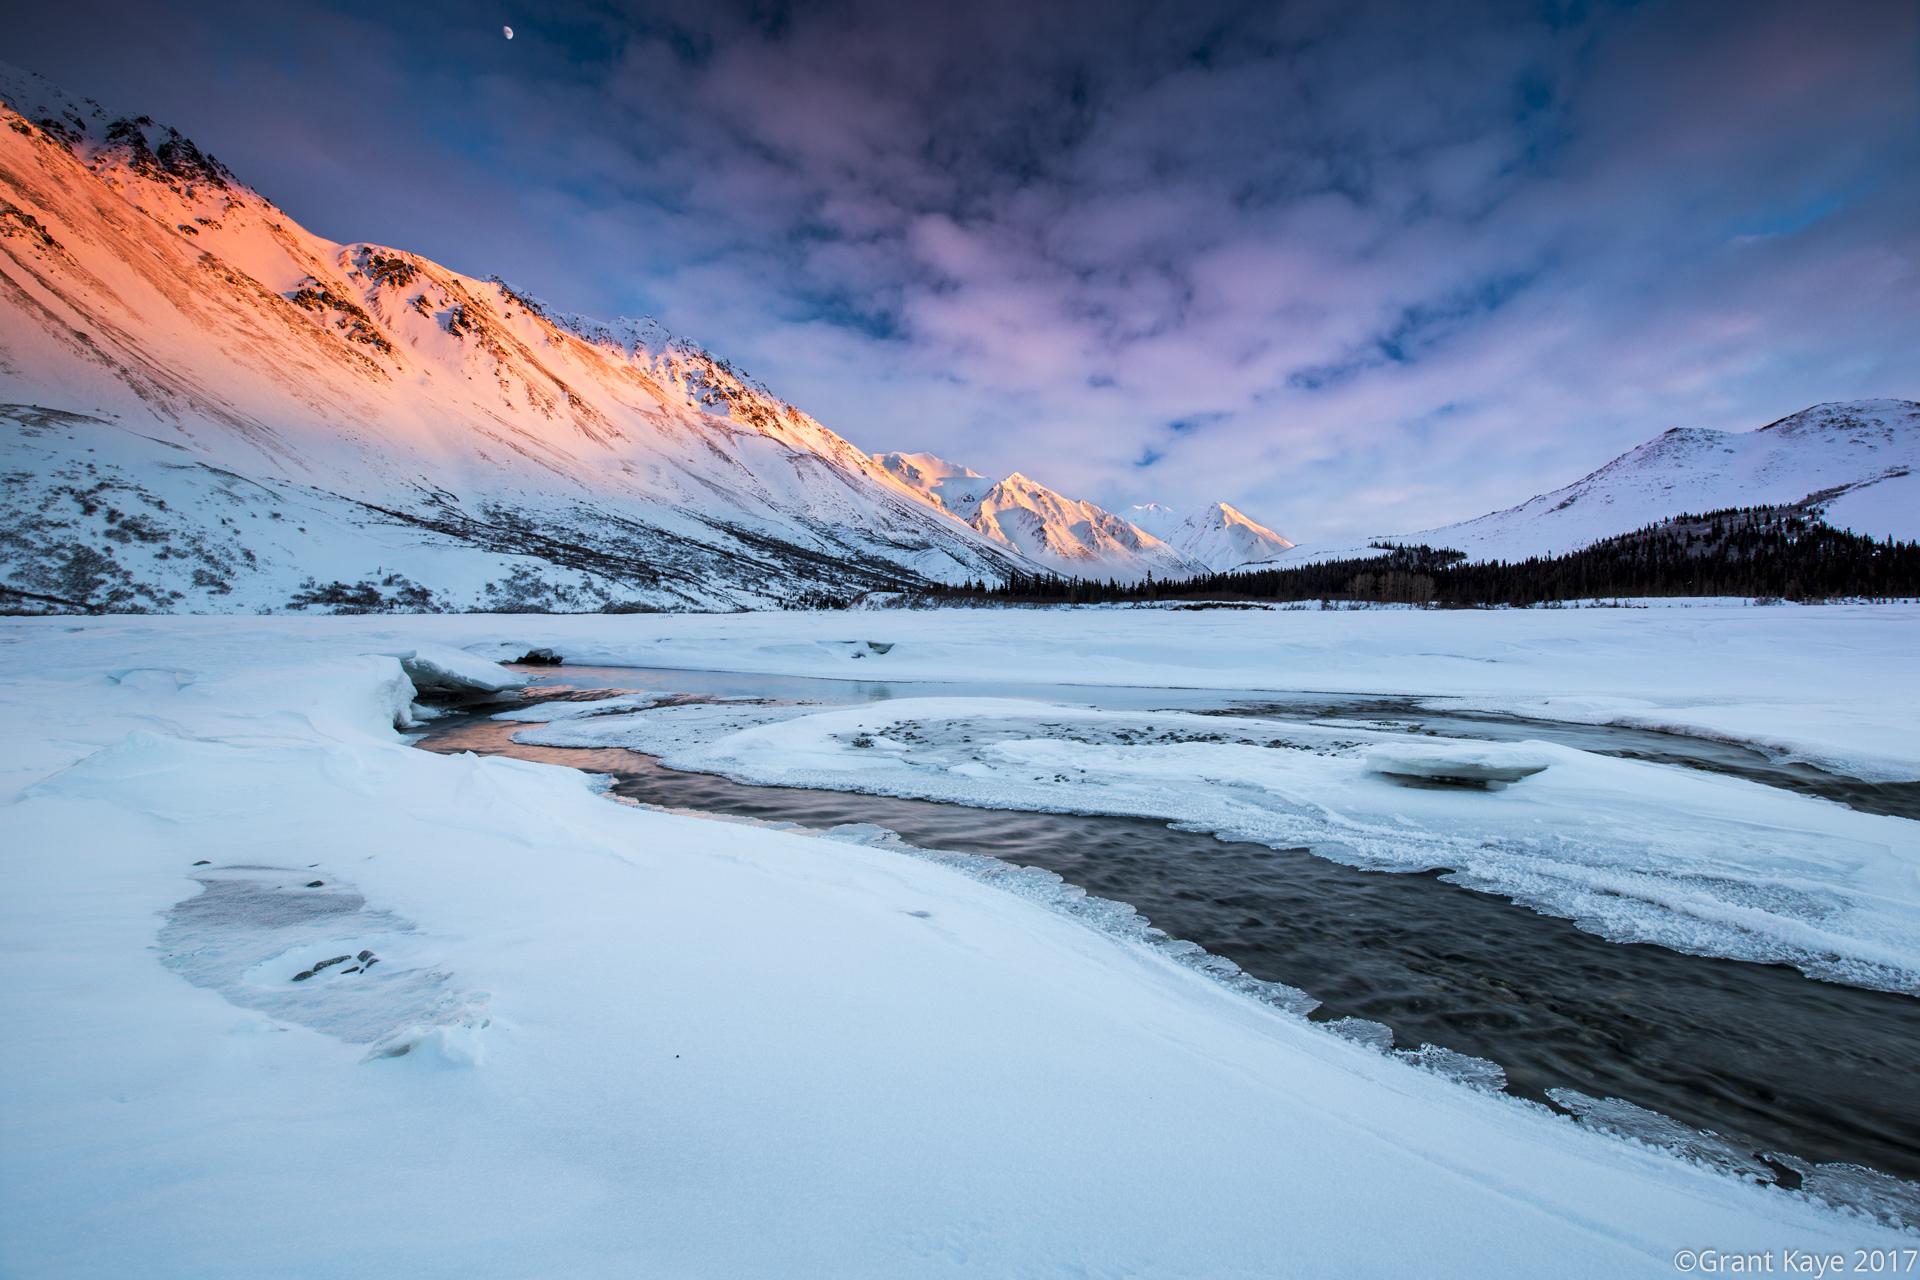 Last Light in the Alaska Range